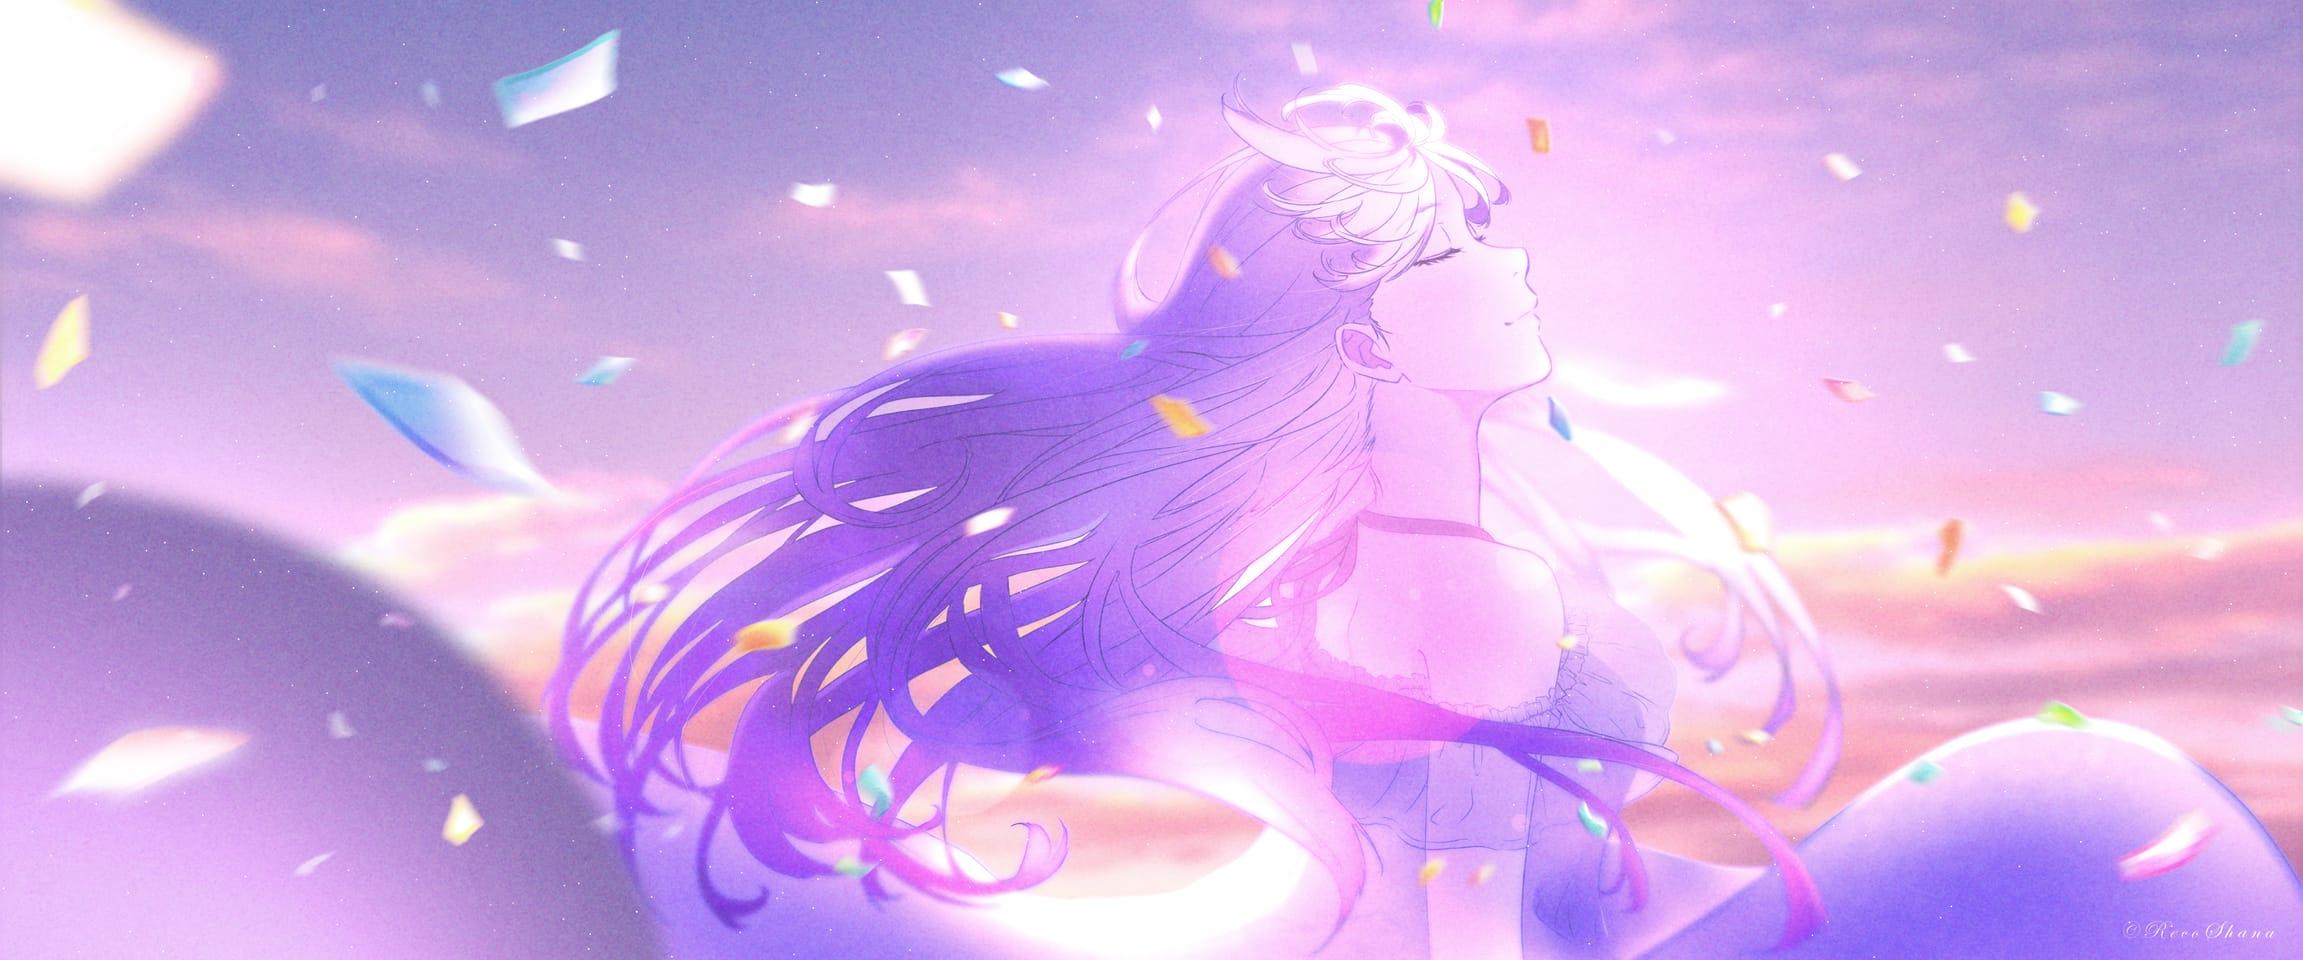 SHE WAITED Illust of recoshana pink sky animeart animegirl anime illustration digitalillustration clouds